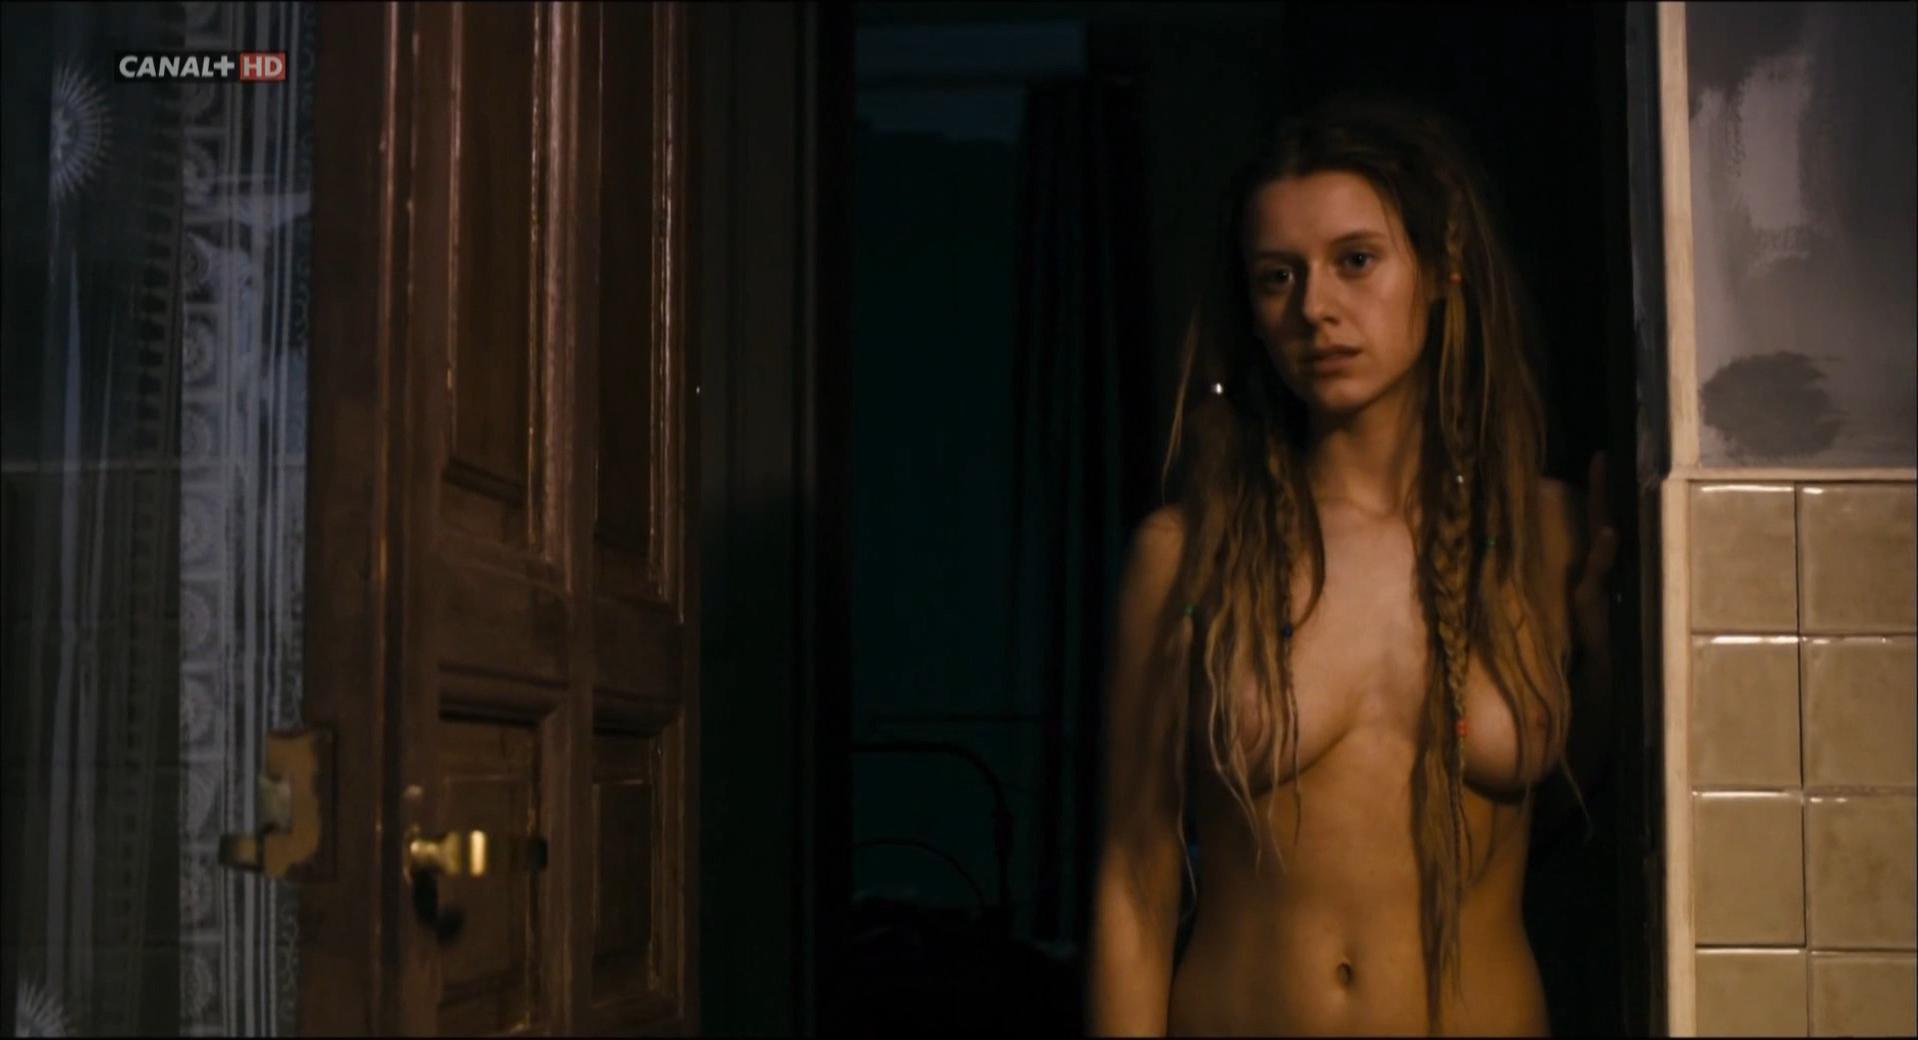 Manuela Velles nude - Chaotic Ana (2007)